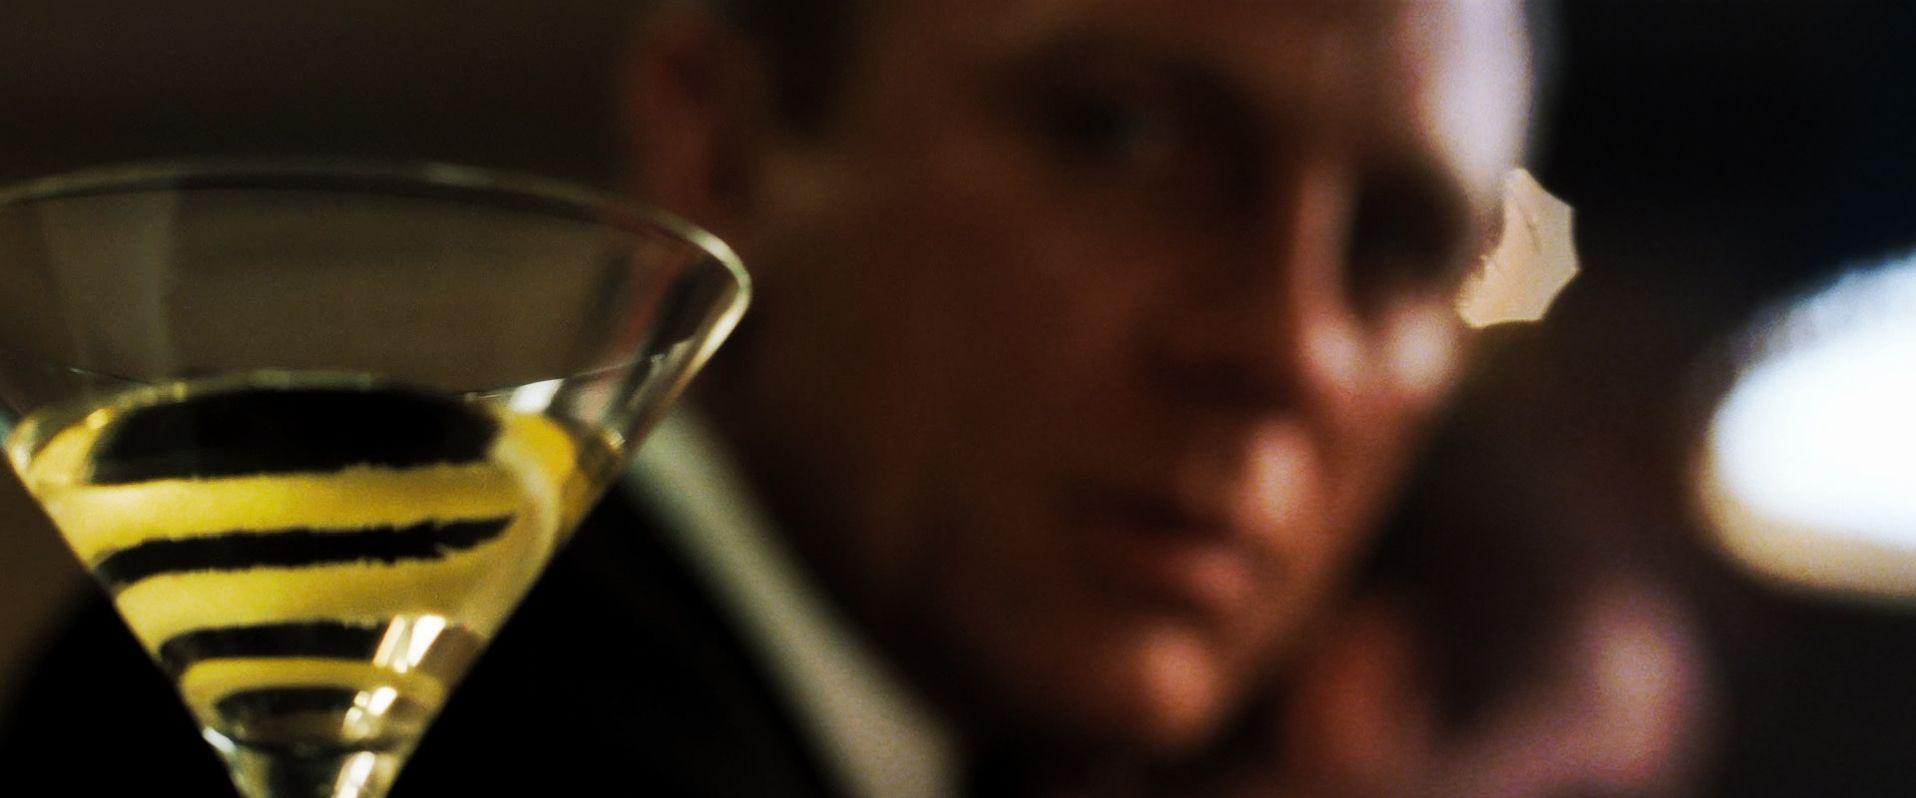 007 martini casino royale no deposit casino bonus no money